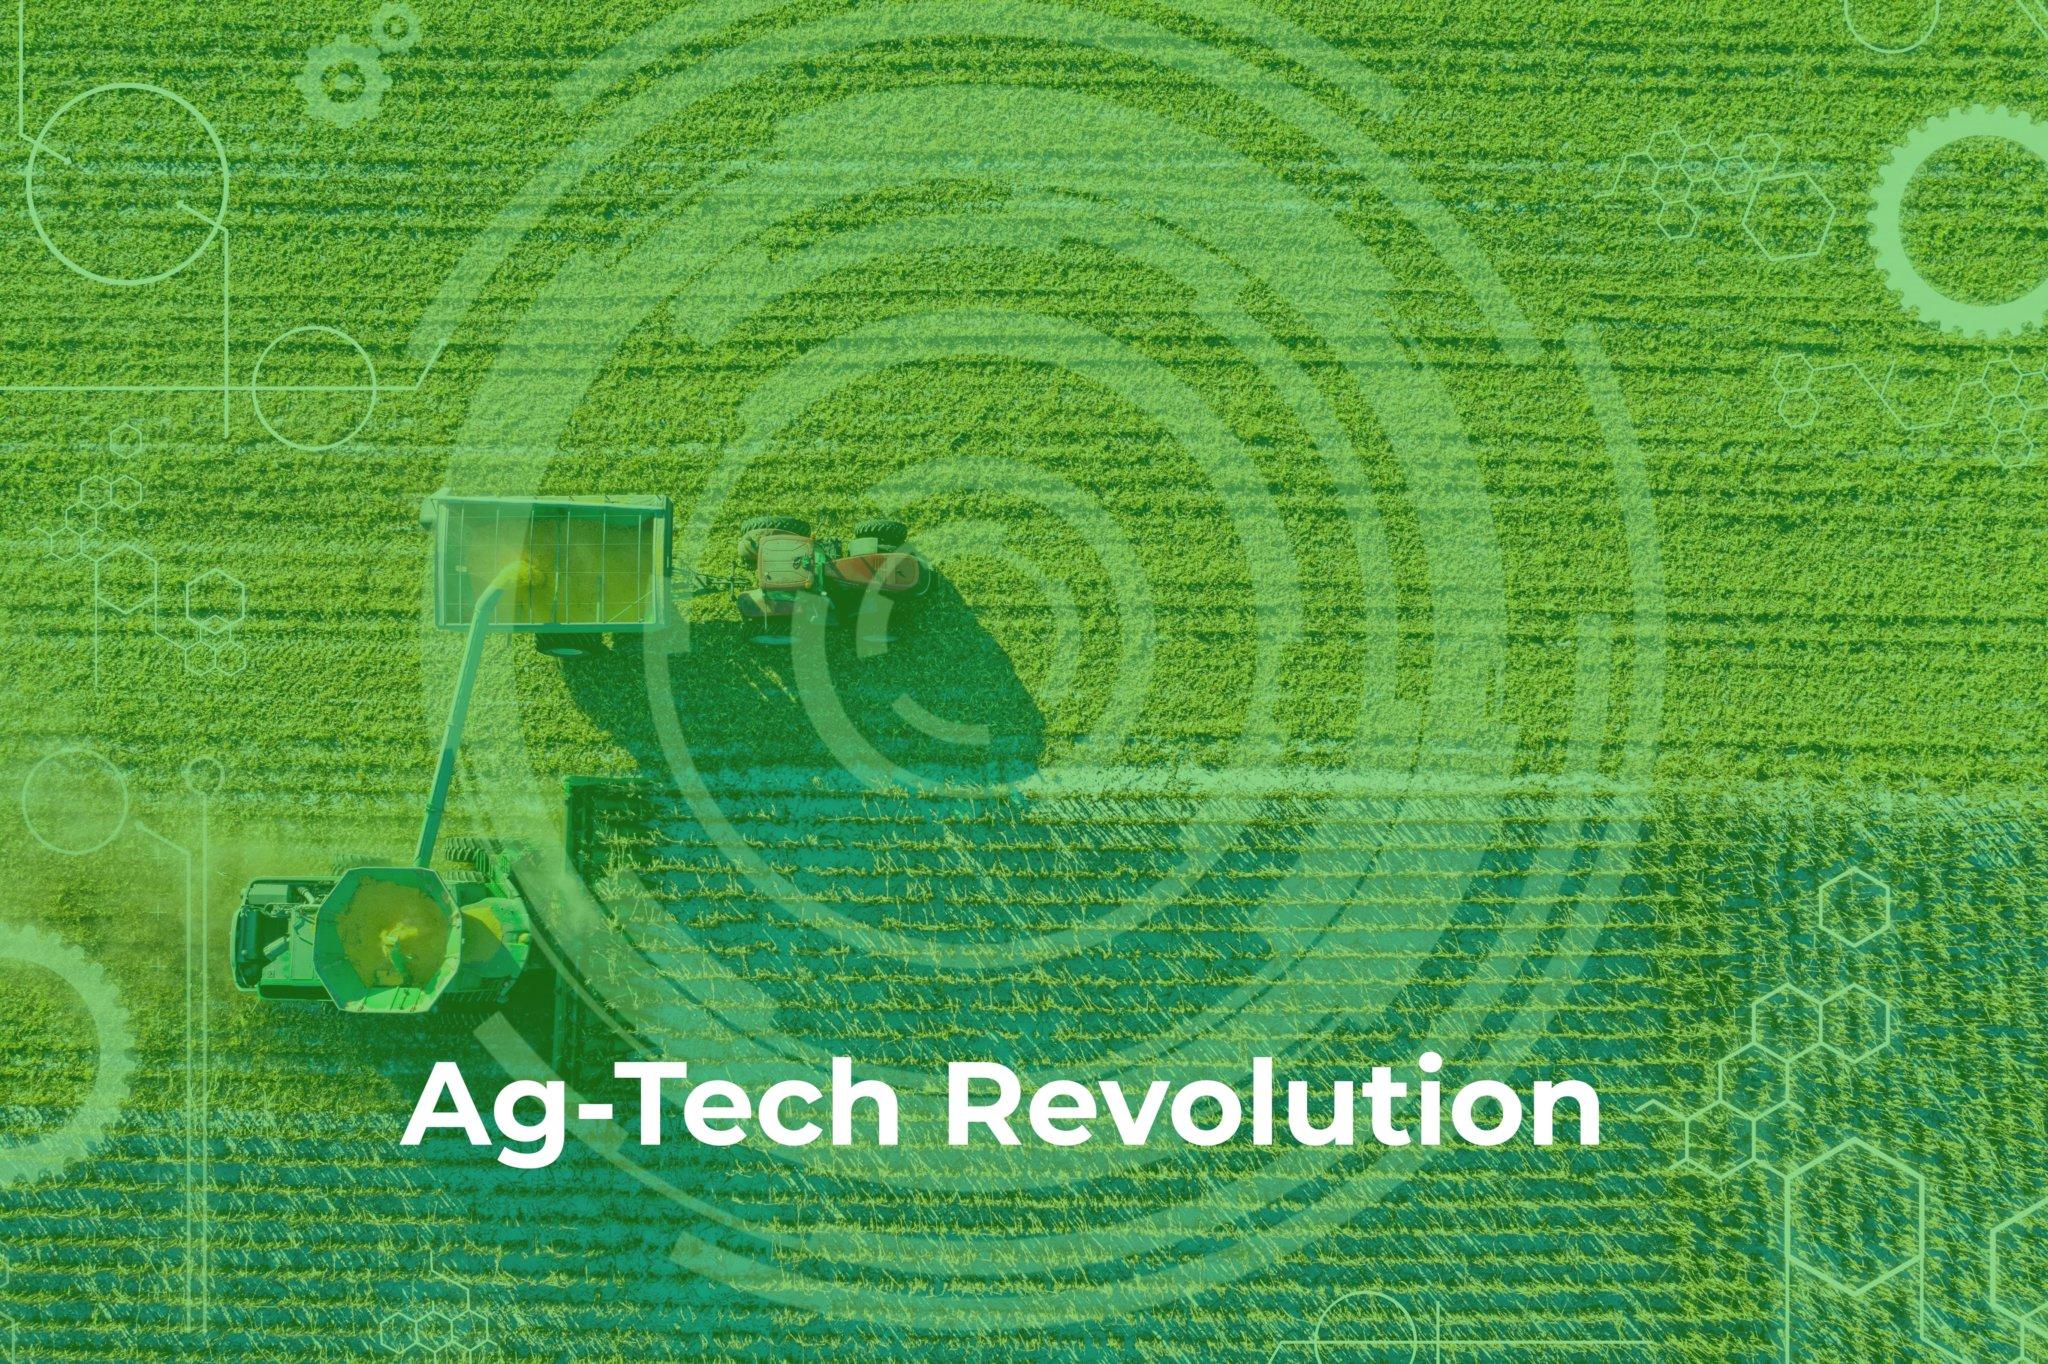 The AG-Tech revolution in Israel